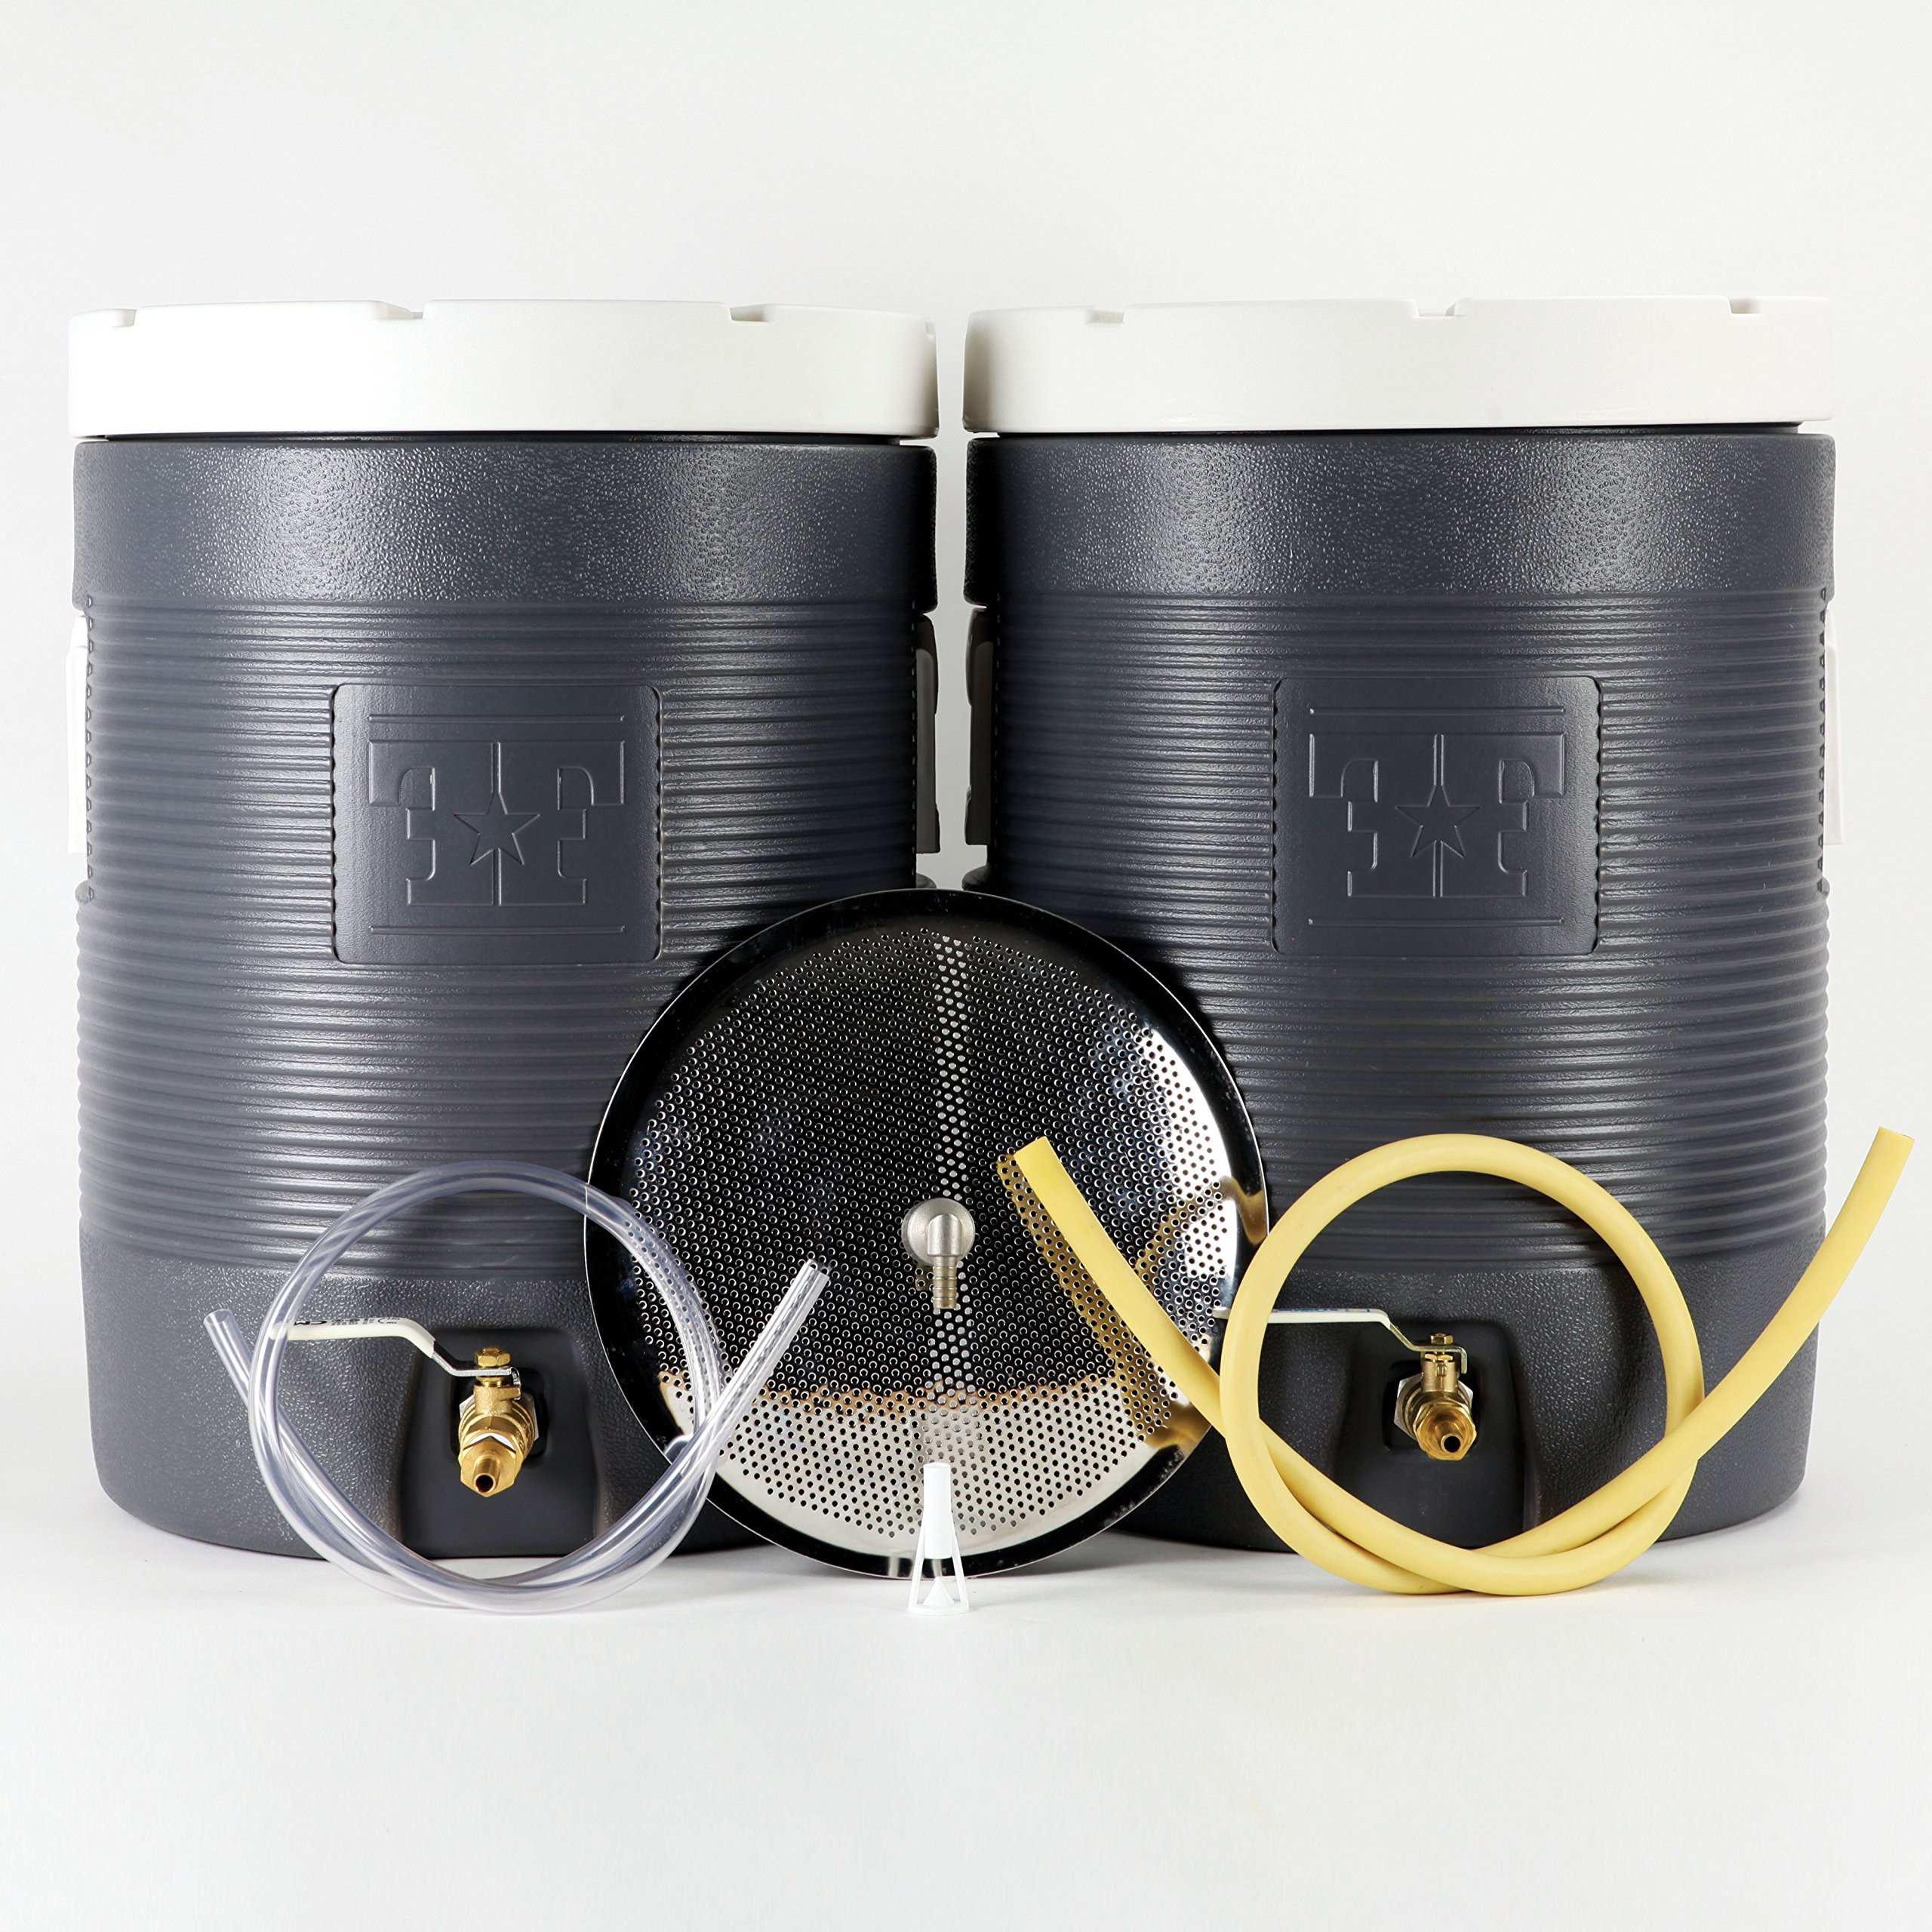 Fermenter's Favorites Essential All Grain Brewing Starter Kit - 10 Gallon Mash Tun and Hot Liquor Tank (HLT)